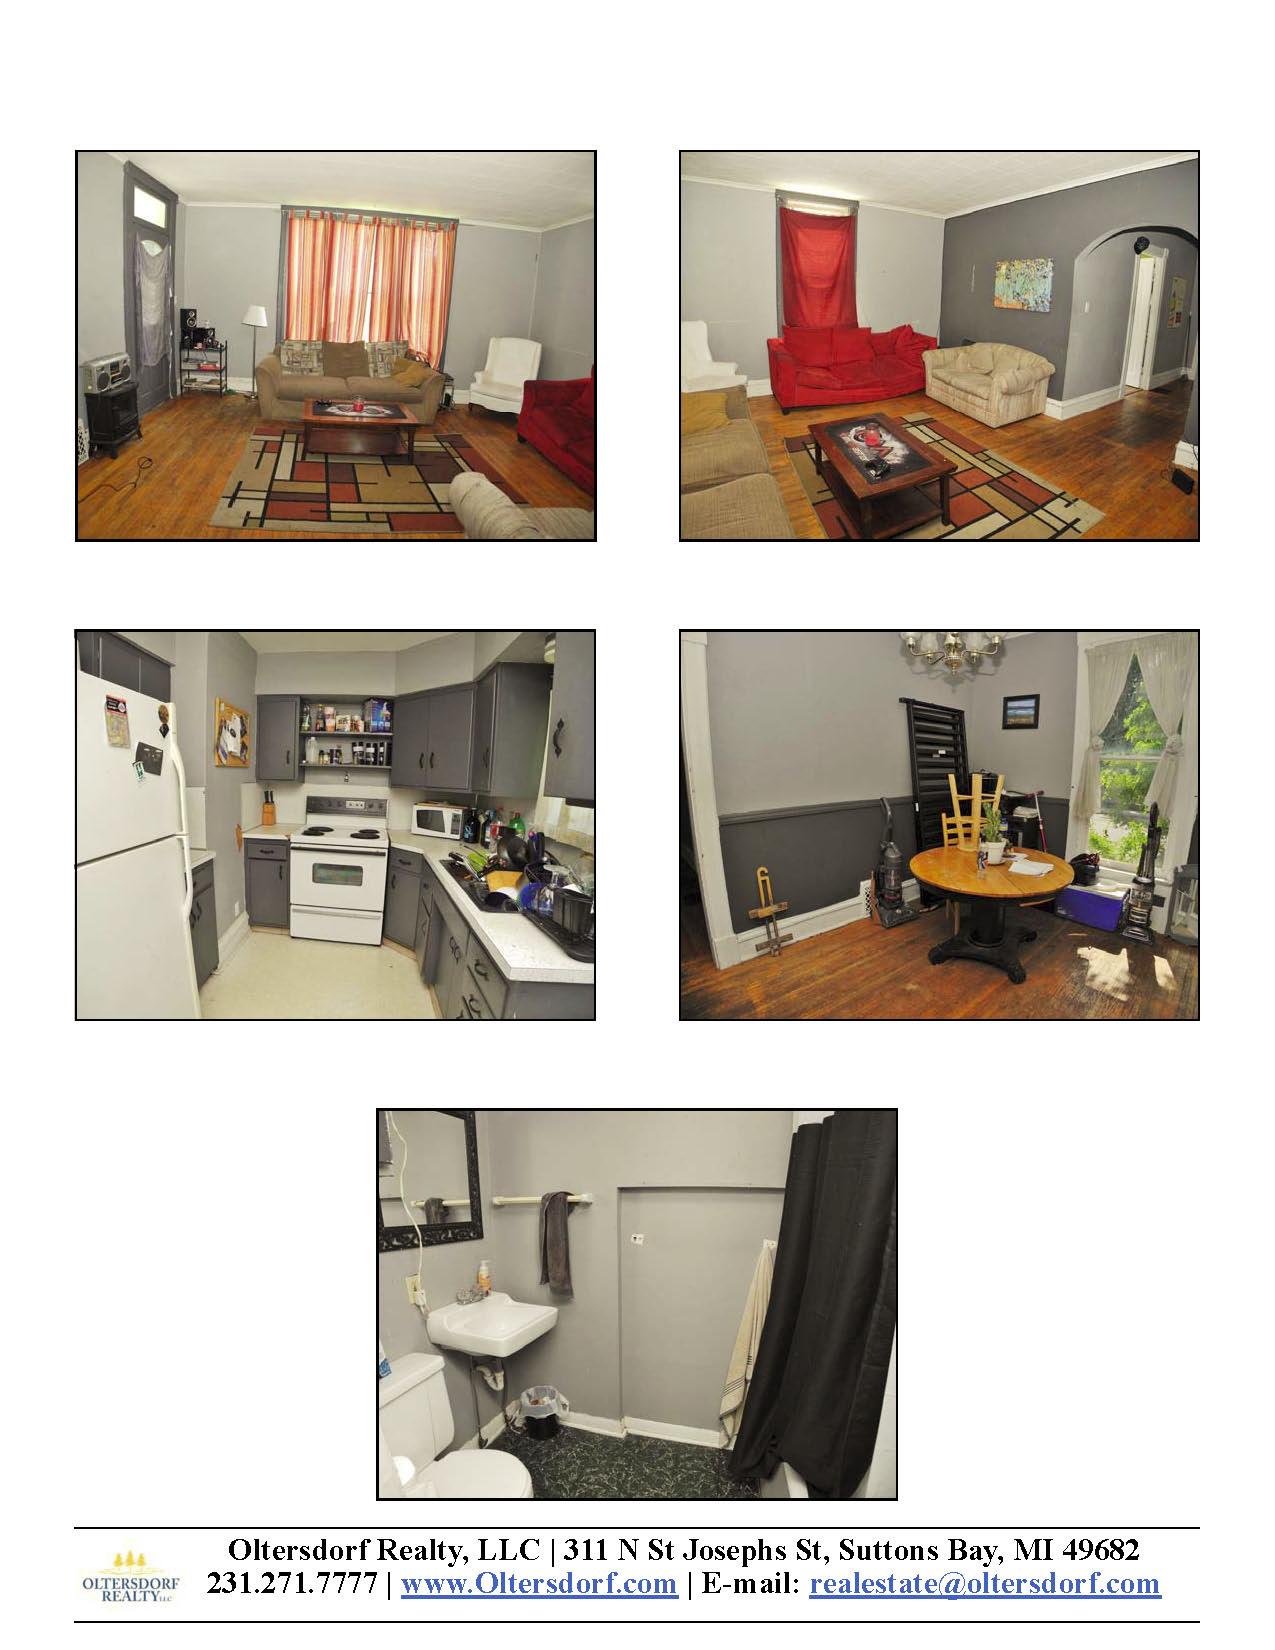 224 W Eighth St, Traverse City, MI – Downtown Traverse City Triplex Marketing Packet - For sale by Oltersdorf Realty LLC (6).jpg